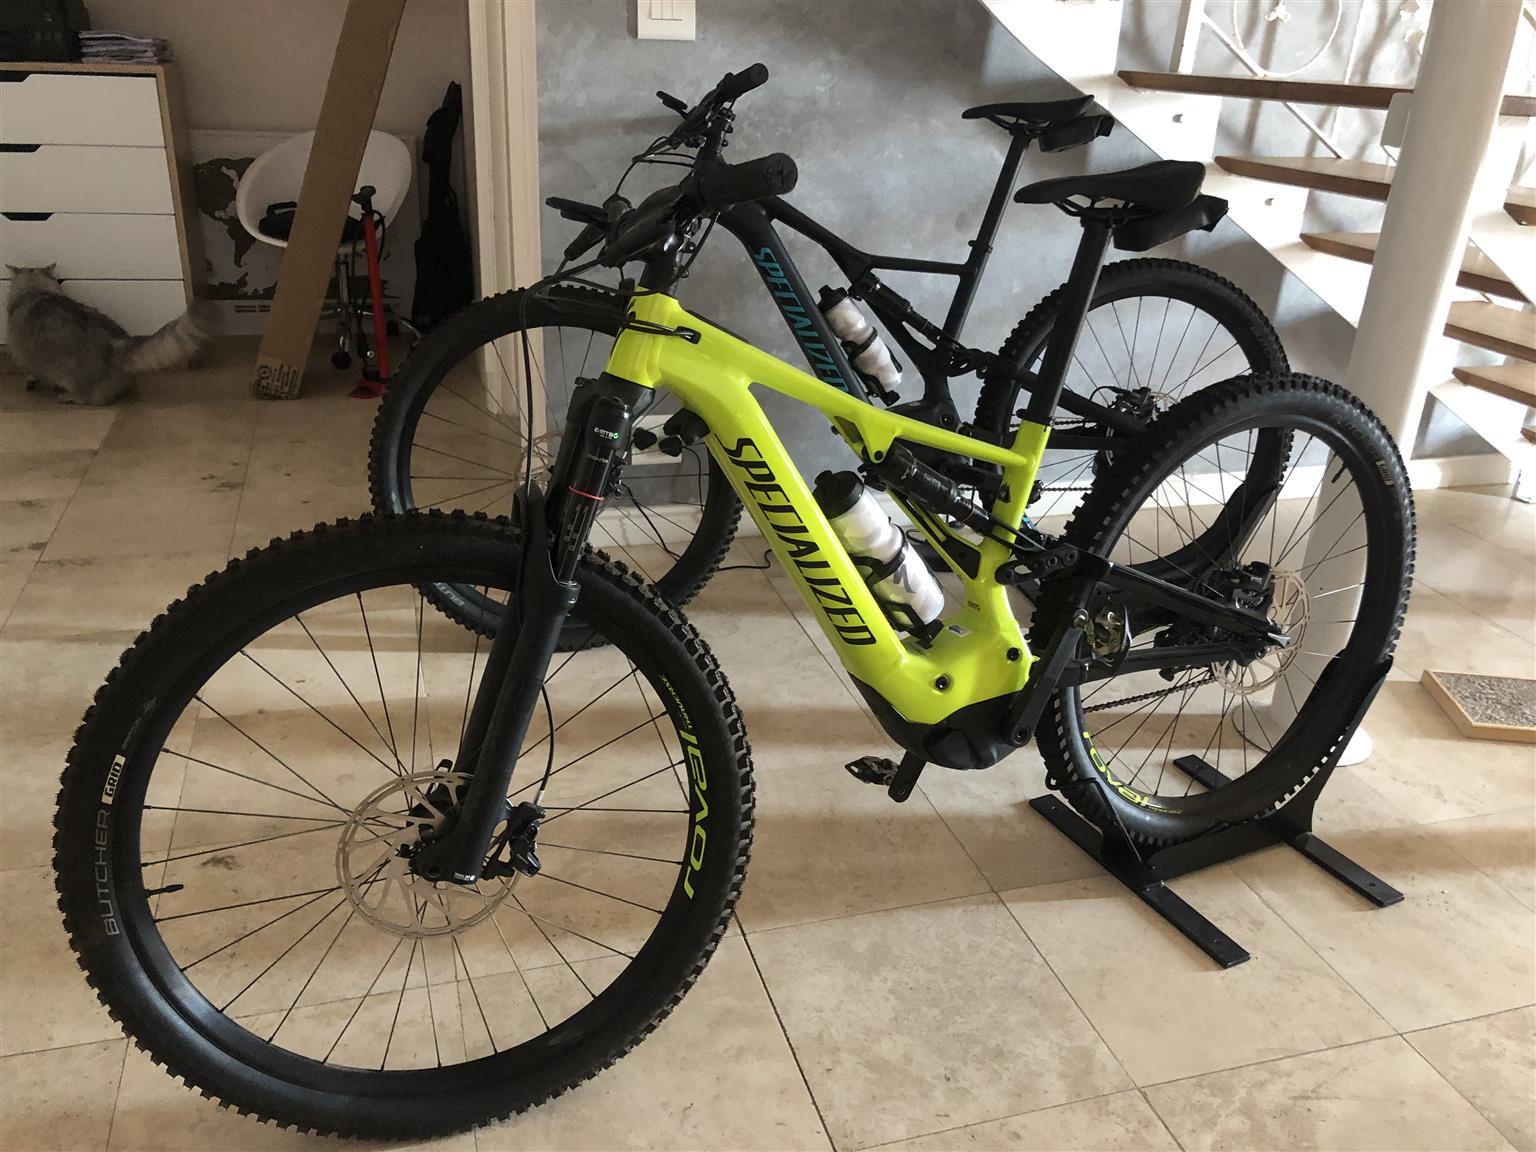 Specialized Turbo Levo 2019 & Thule bike carrier rack